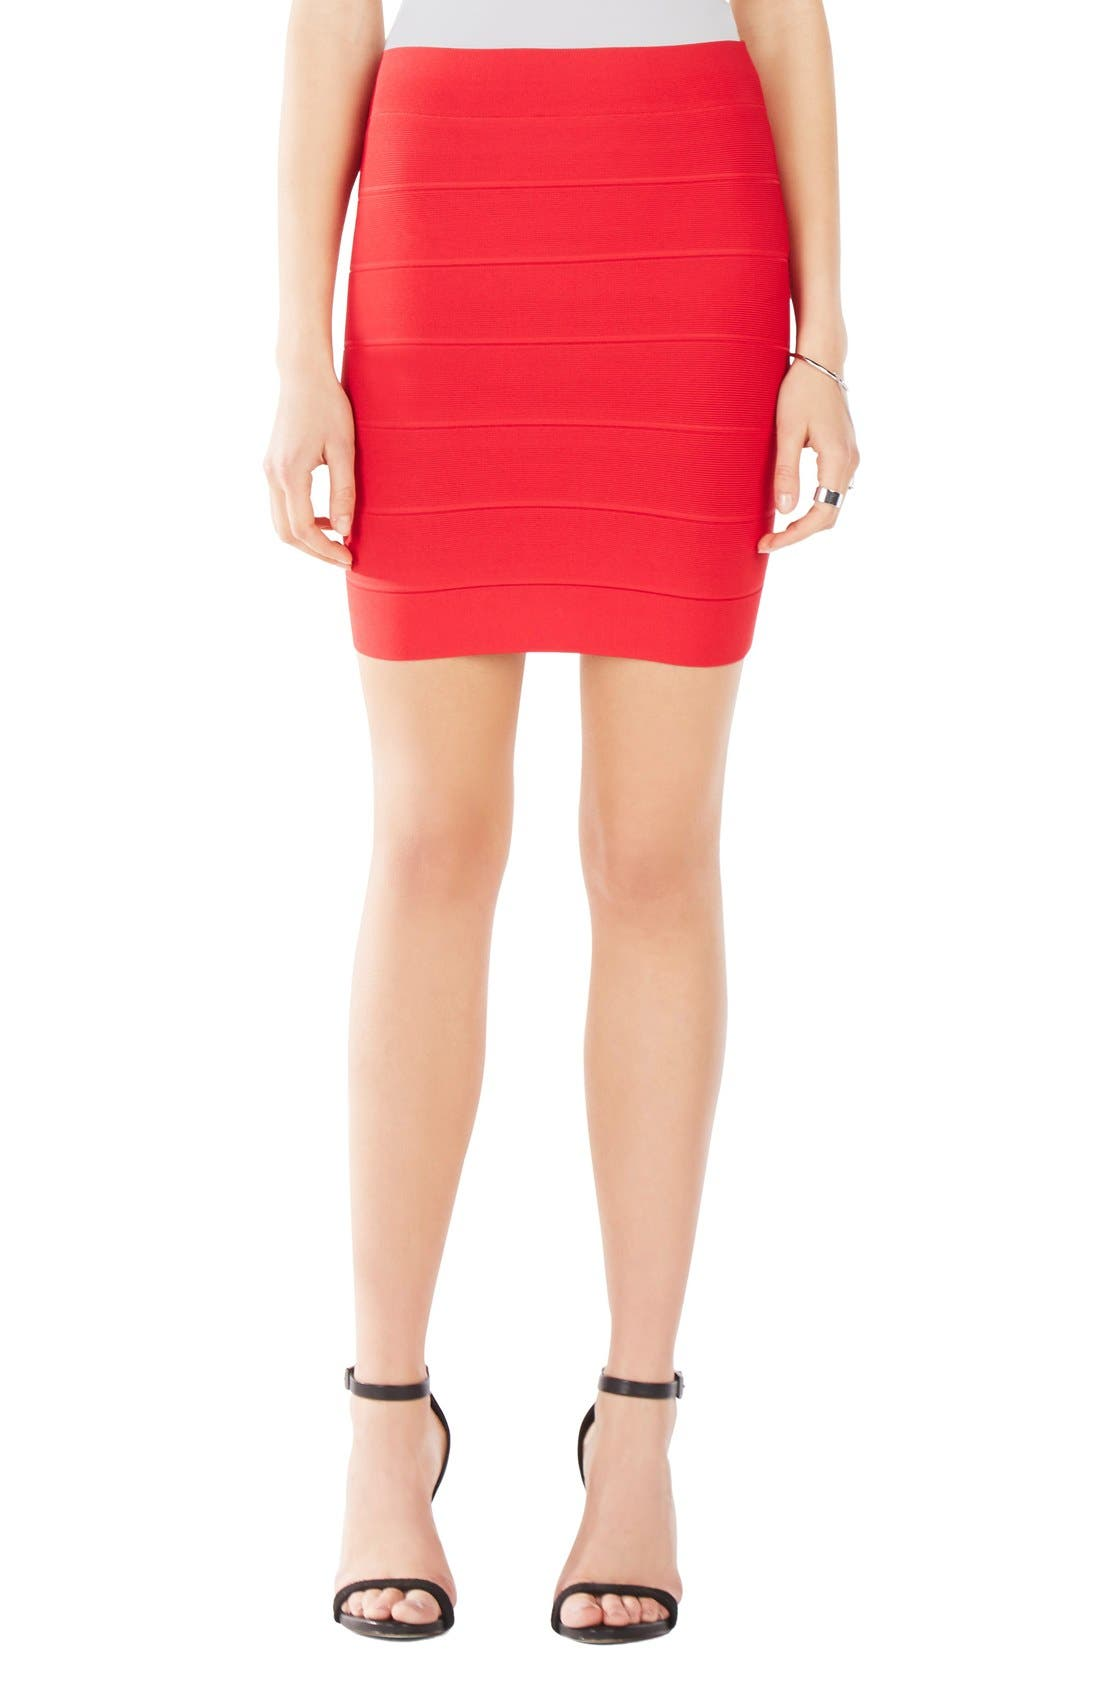 Alternate Image 1 Selected - BCBGMAXAZRIA 'Simone' Bandage Knit Pencil Skirt